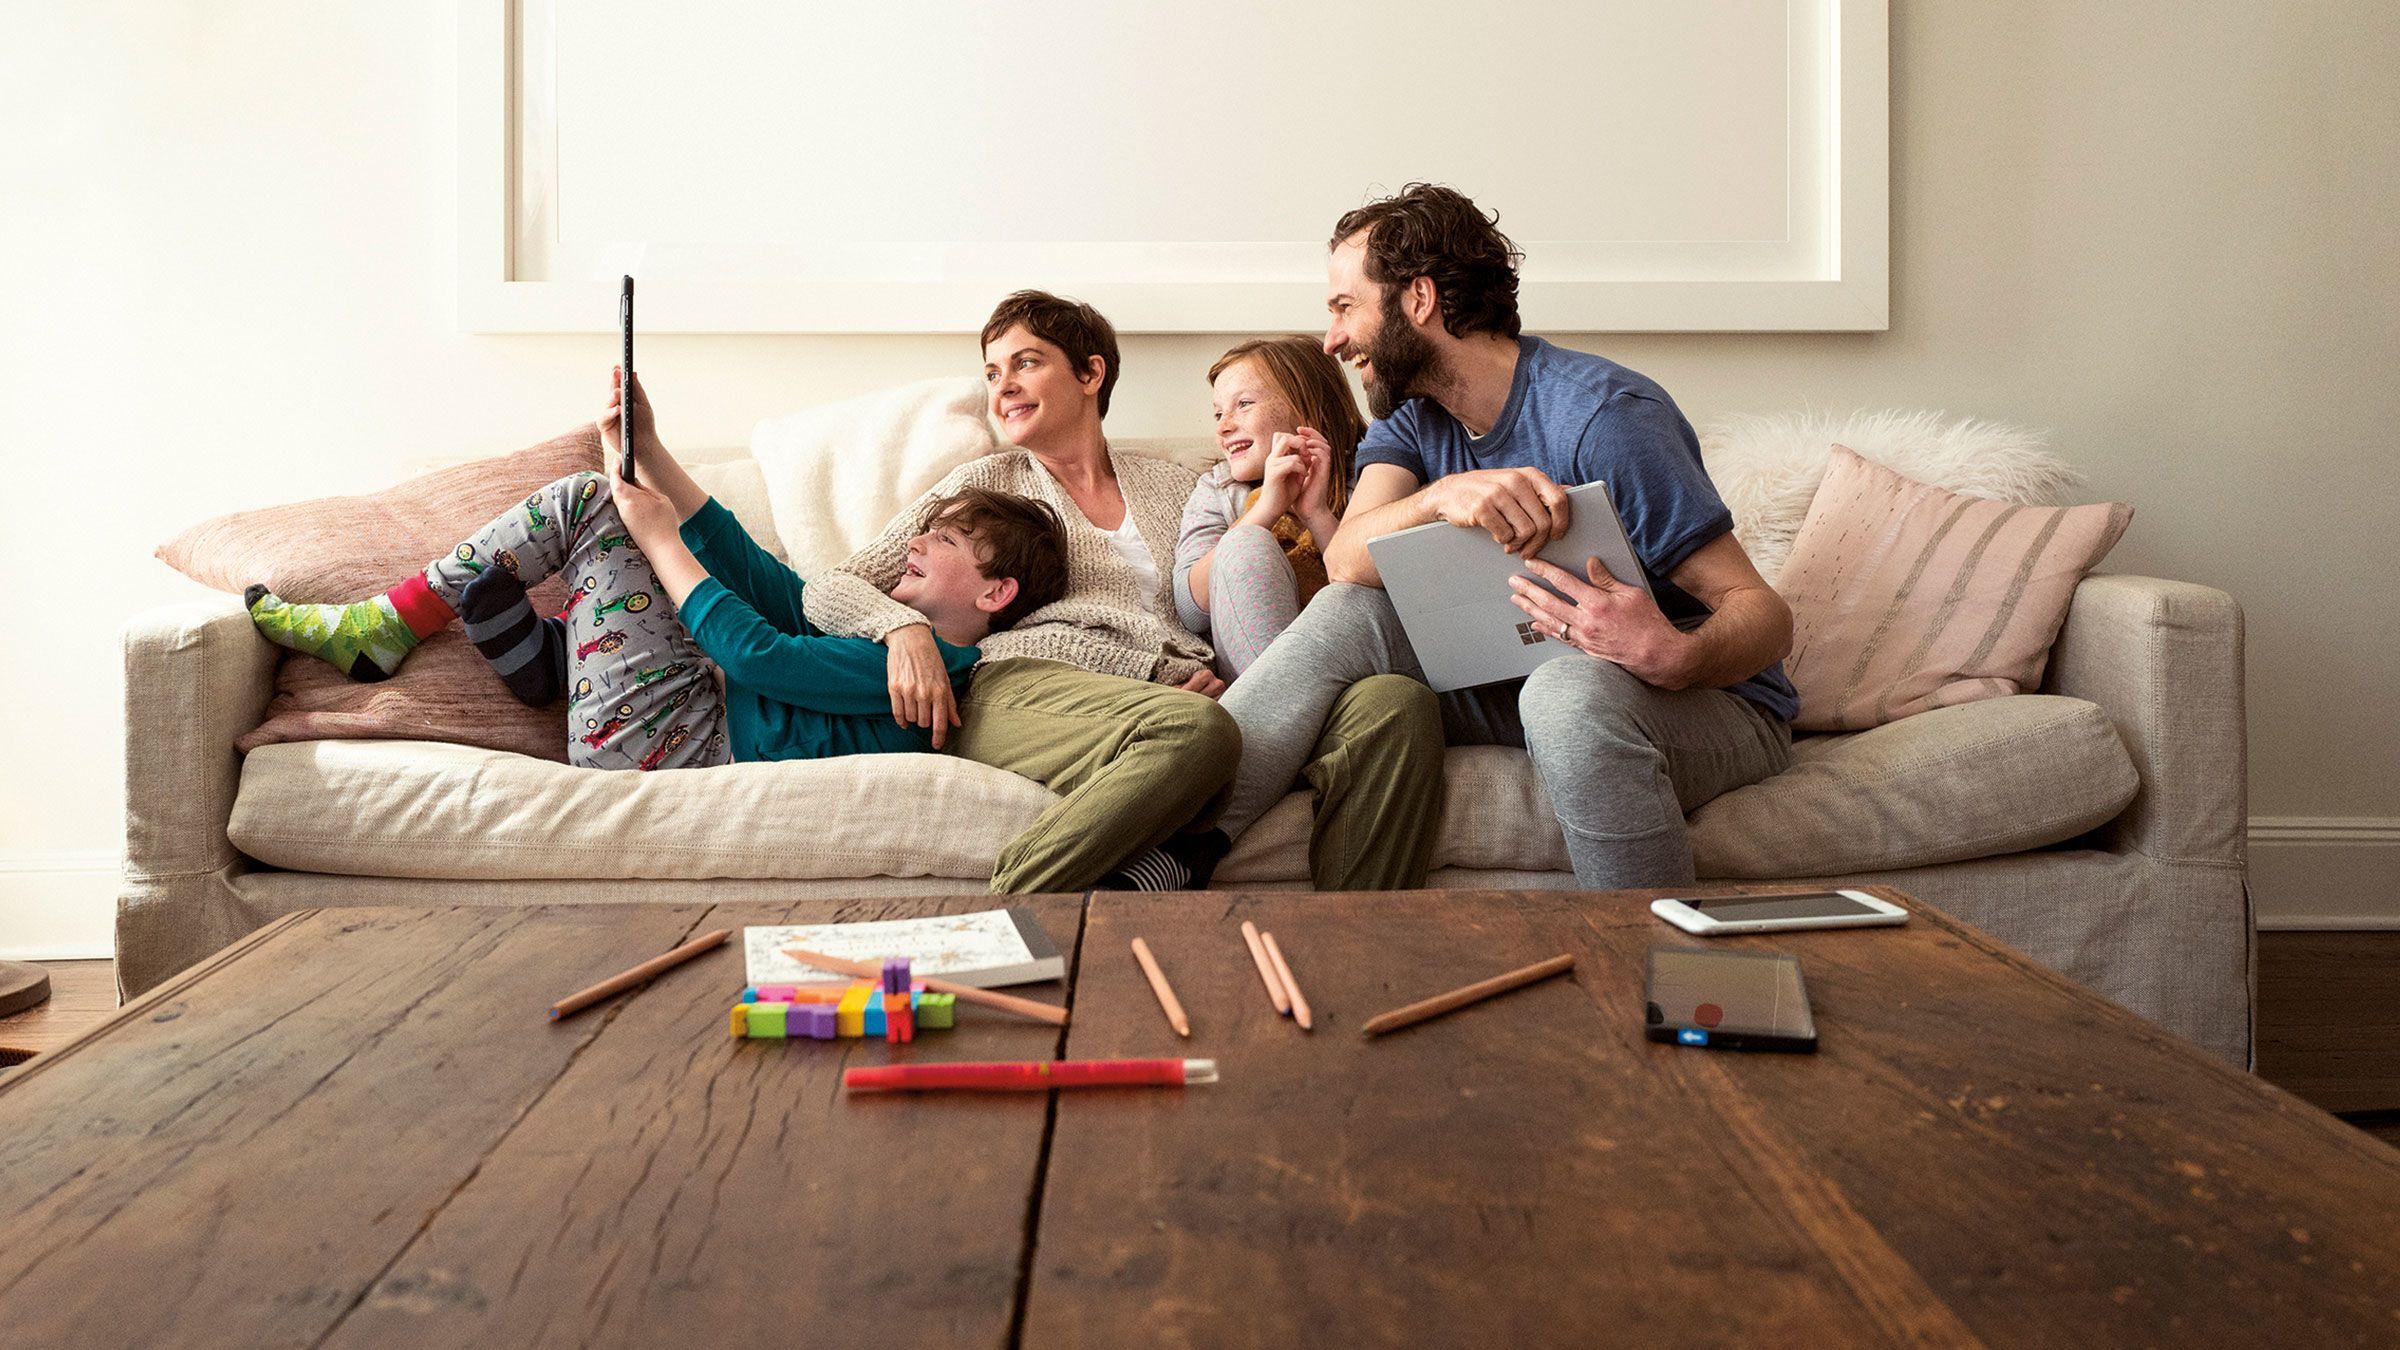 3. Ruang menonton jadi lebih terpakai ruang bersantai mengobrol